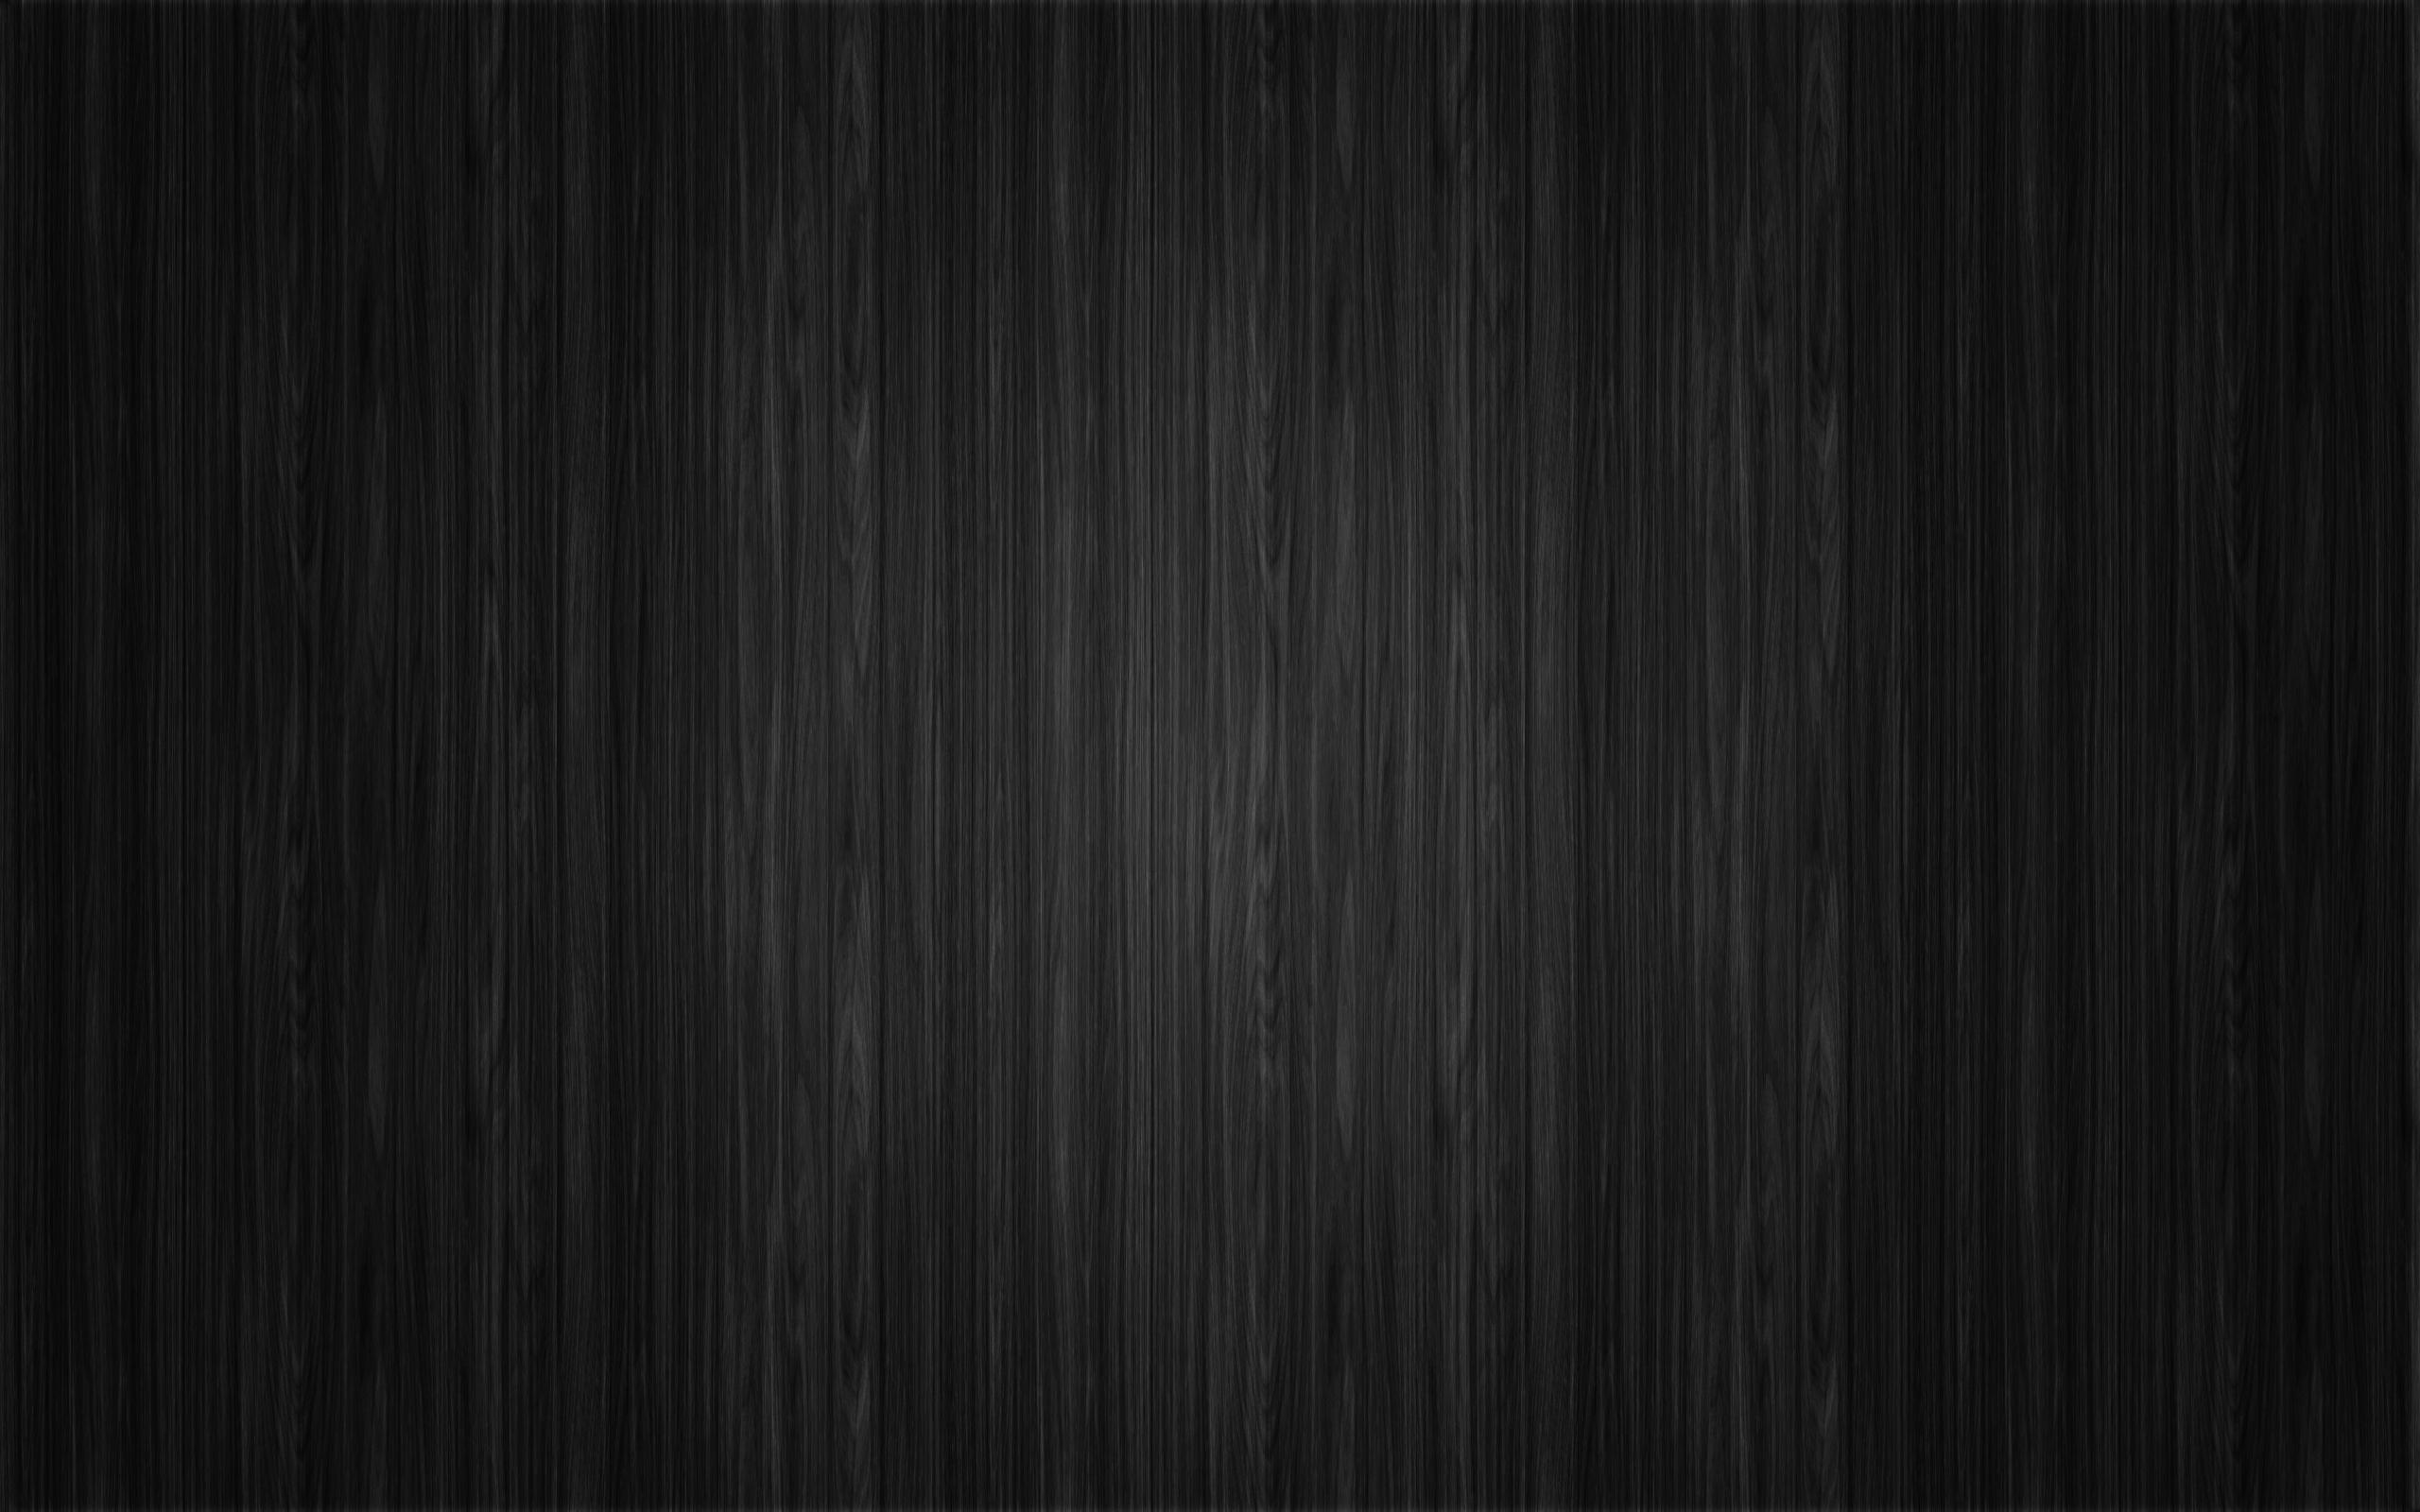 Black 3d Wallpaper 129   HD Desktop Wallpapers HD Wallpaper 3D 2560x1600